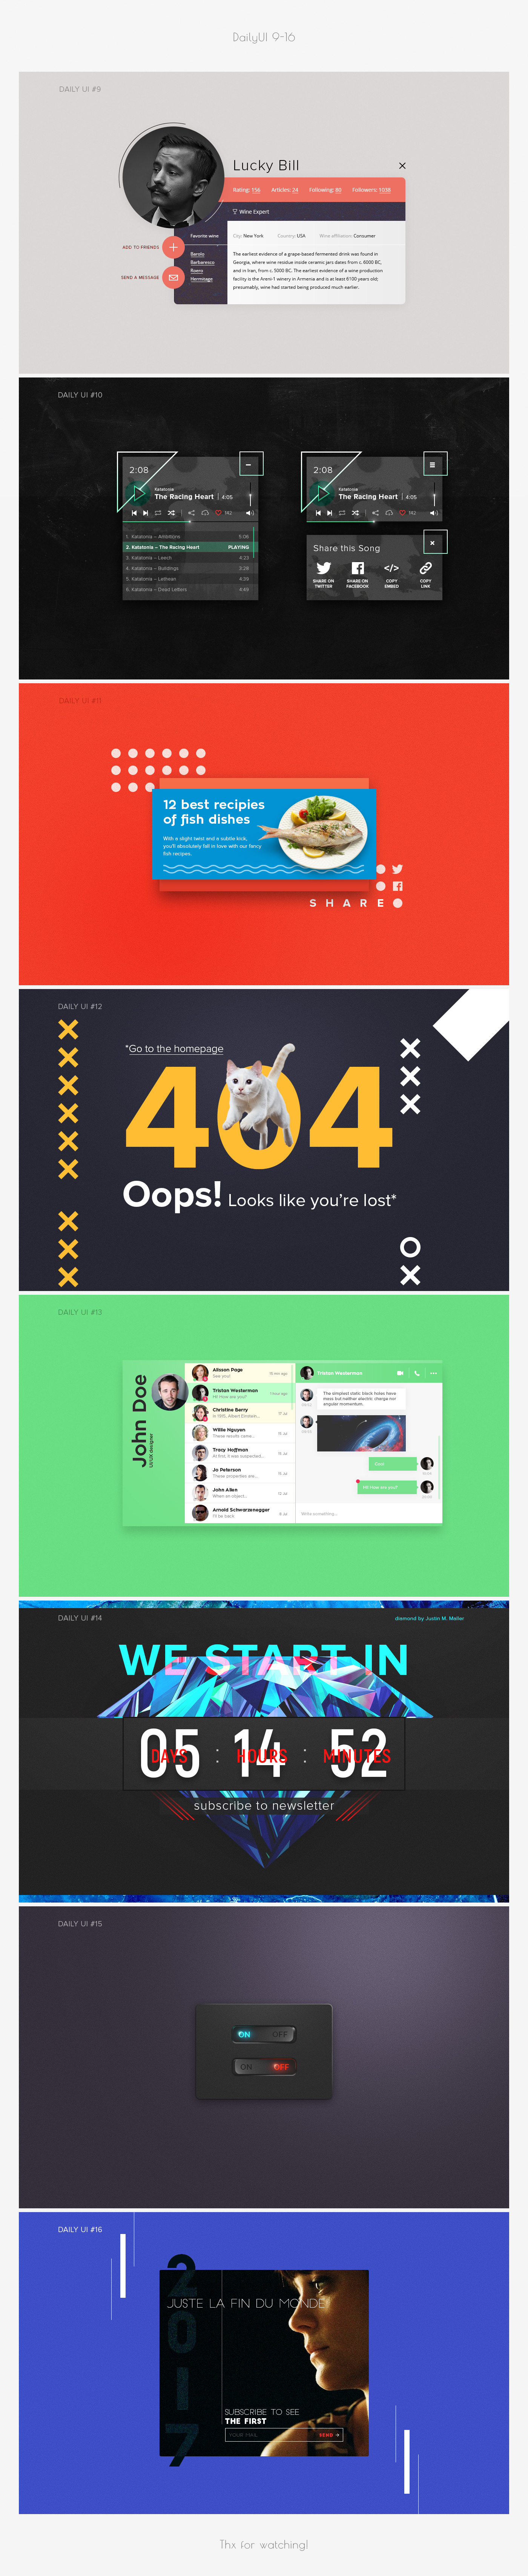 DailyUI,challenge,UI,Web,Popup,player,profile,page404,post